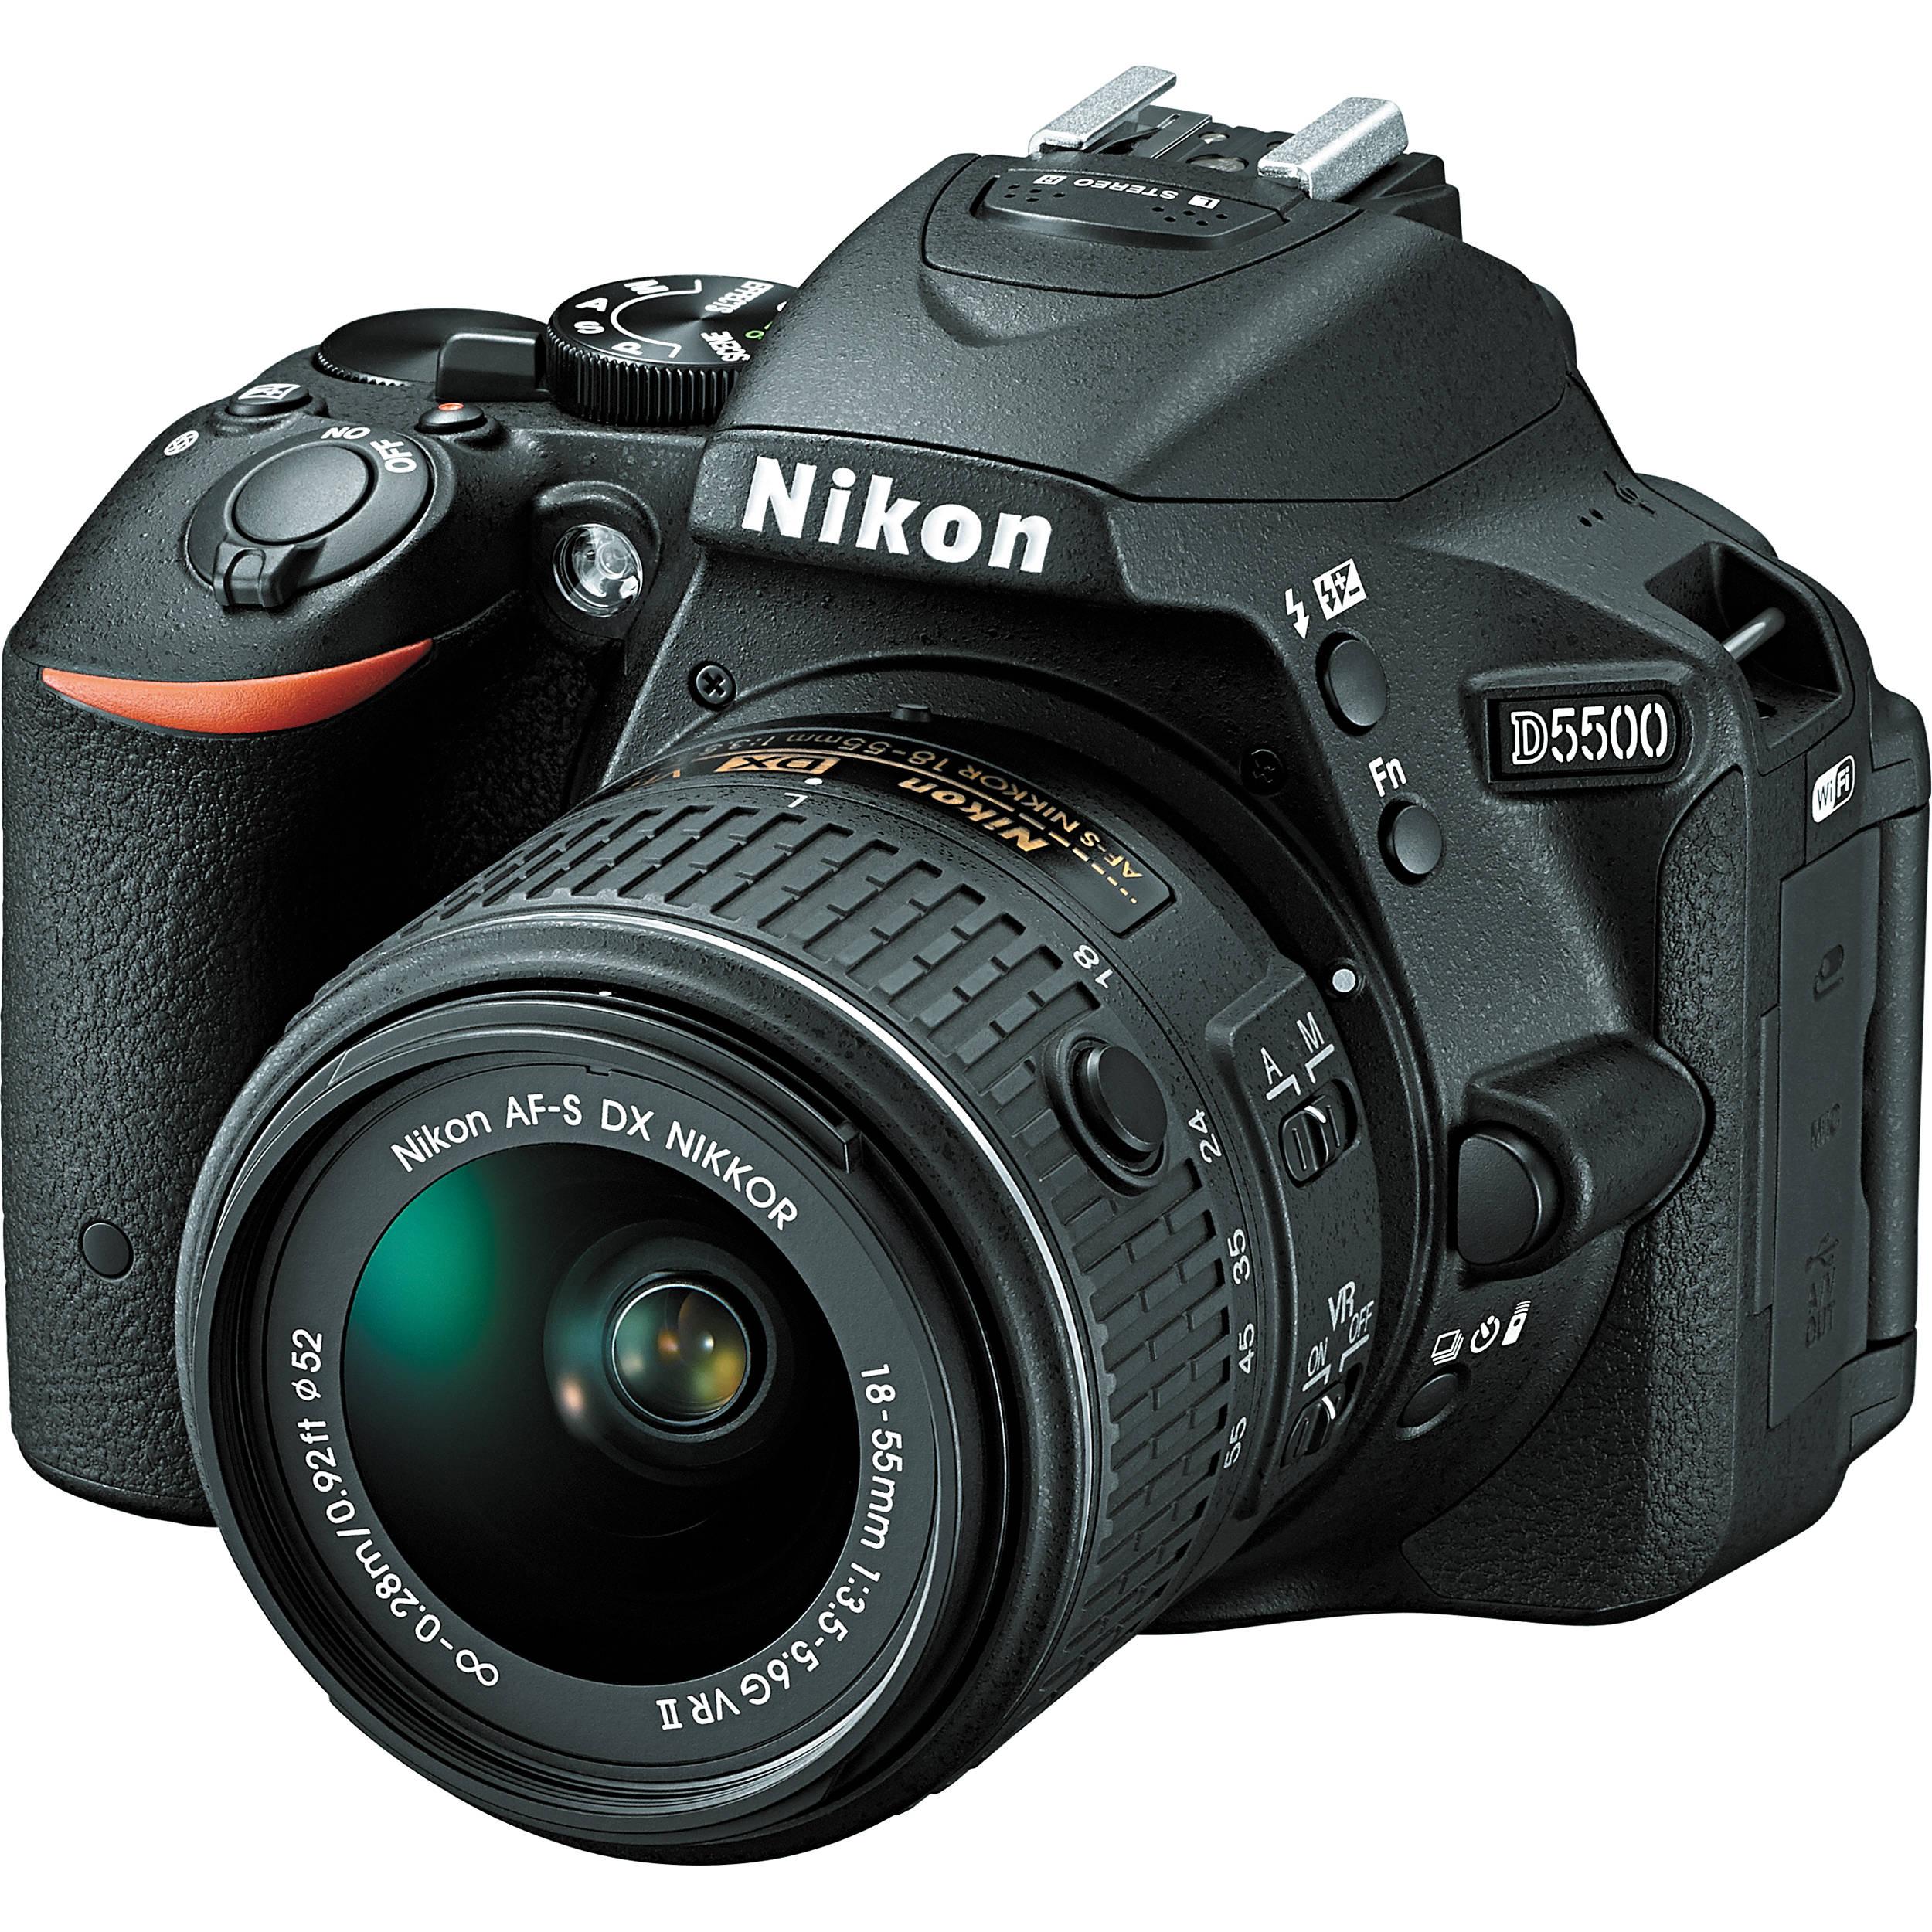 Camera The Newest Nikon Dslr Camera nikon d5500 dslr camera with 18 55mm lens black 1546 bh photo black